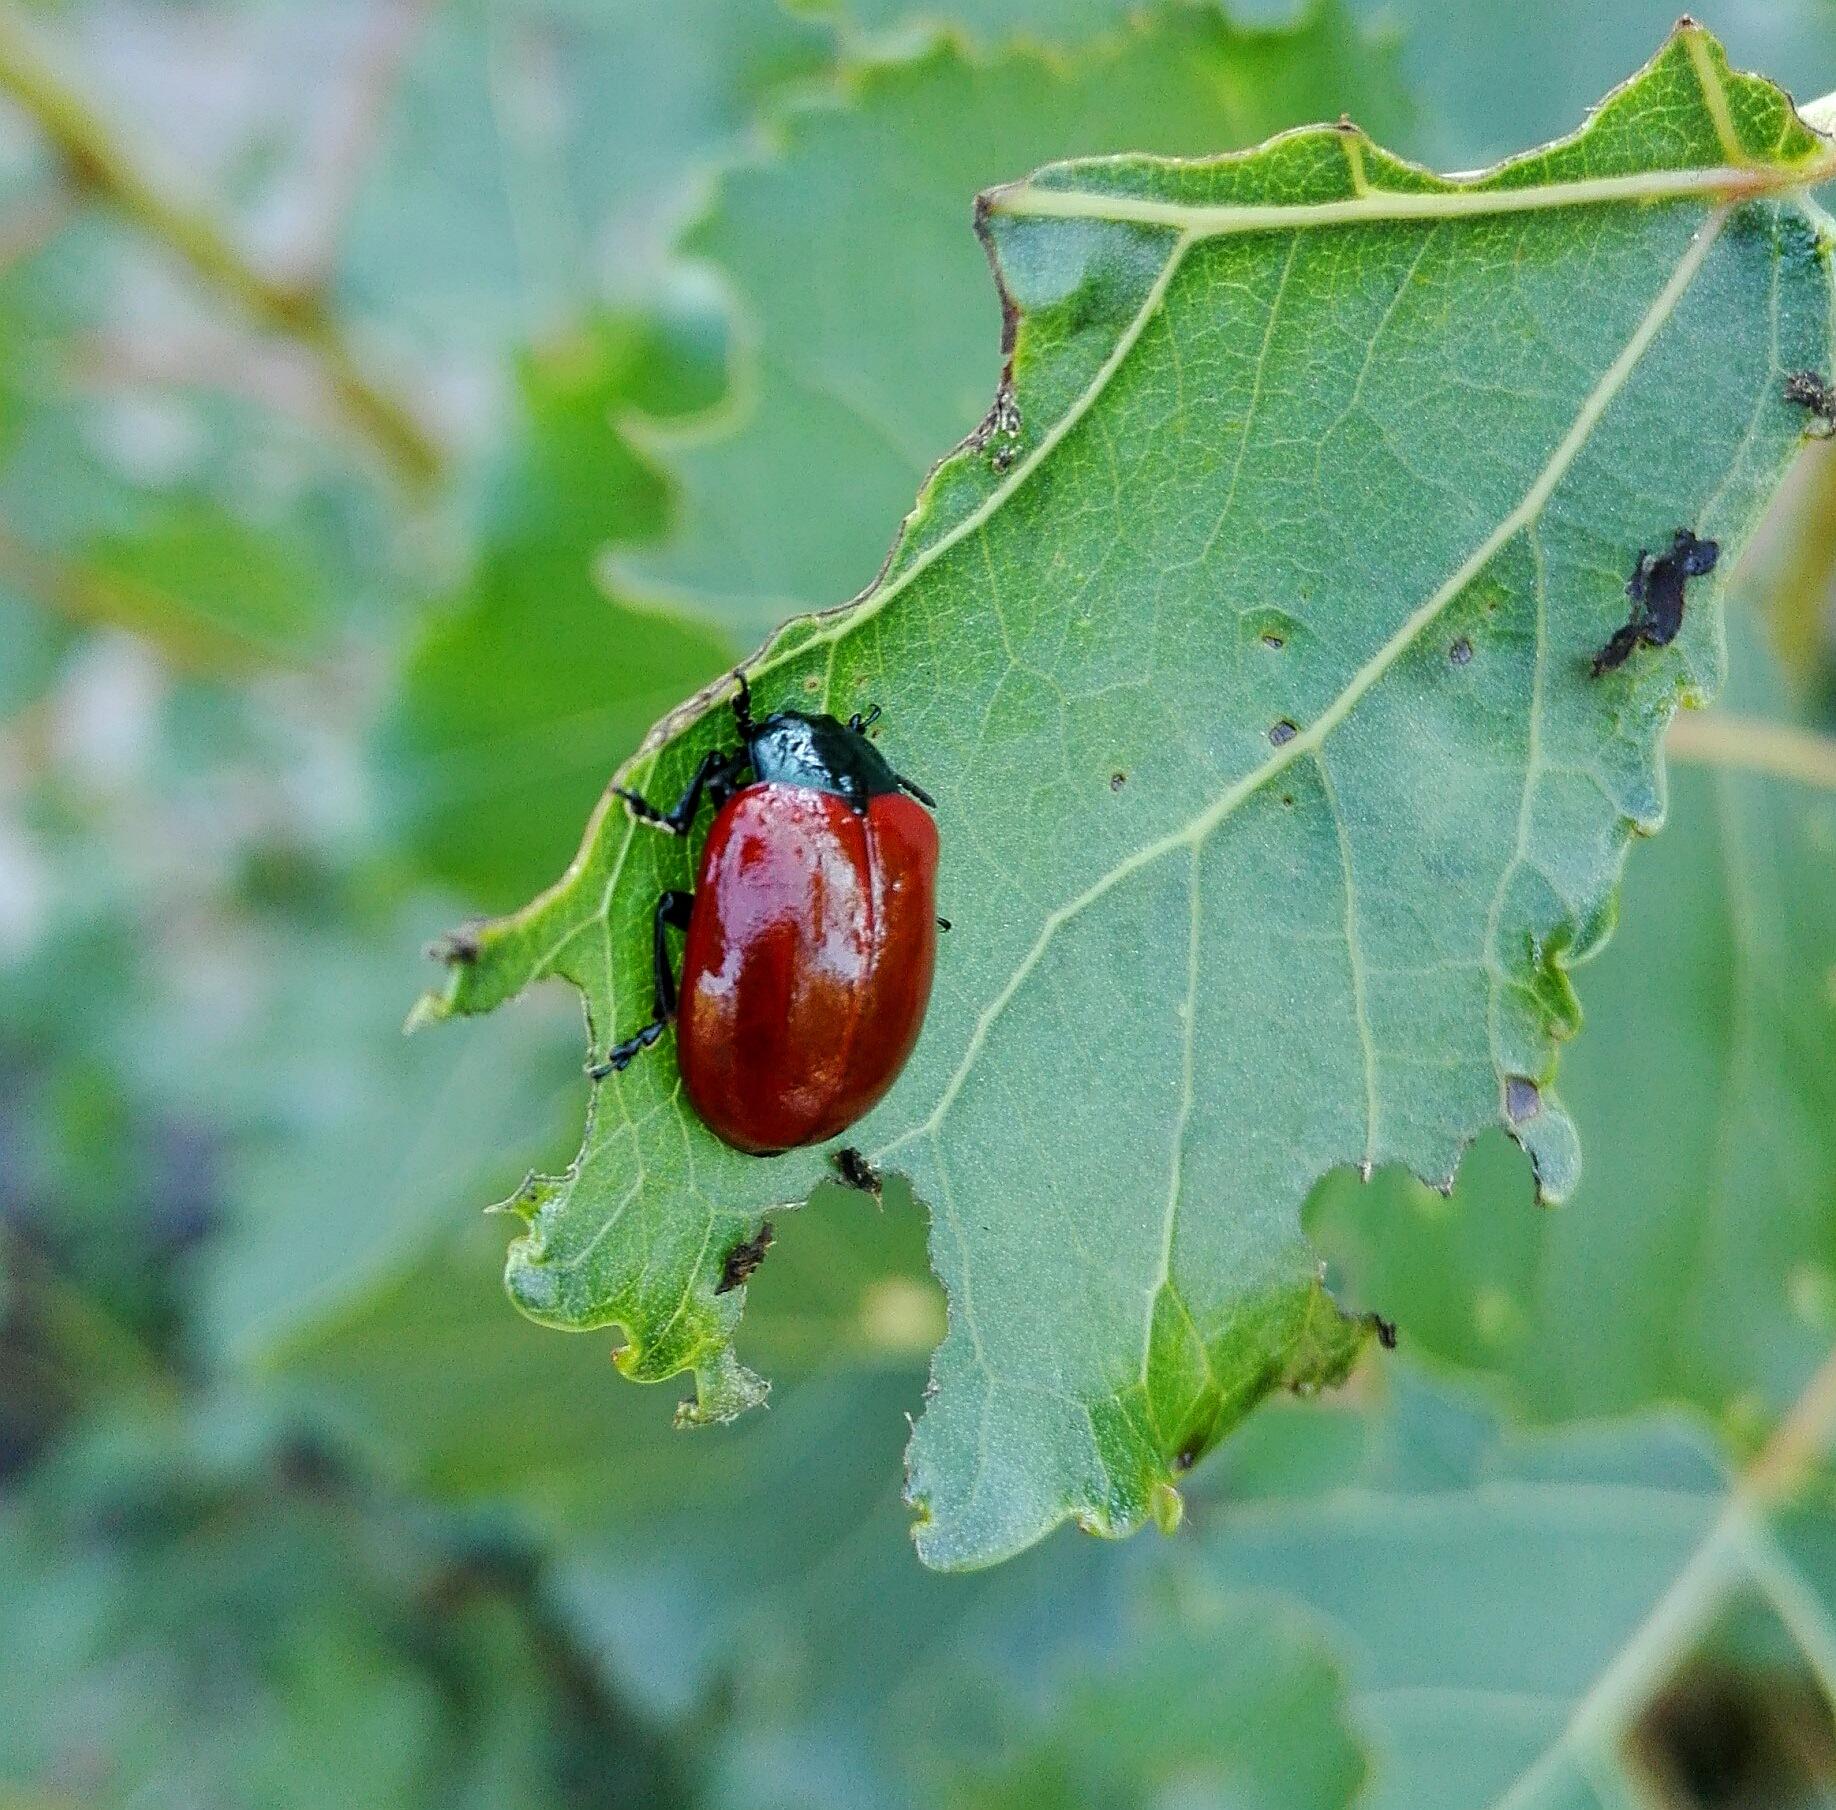 willow leaf beetle by  Gaelle Le Meur